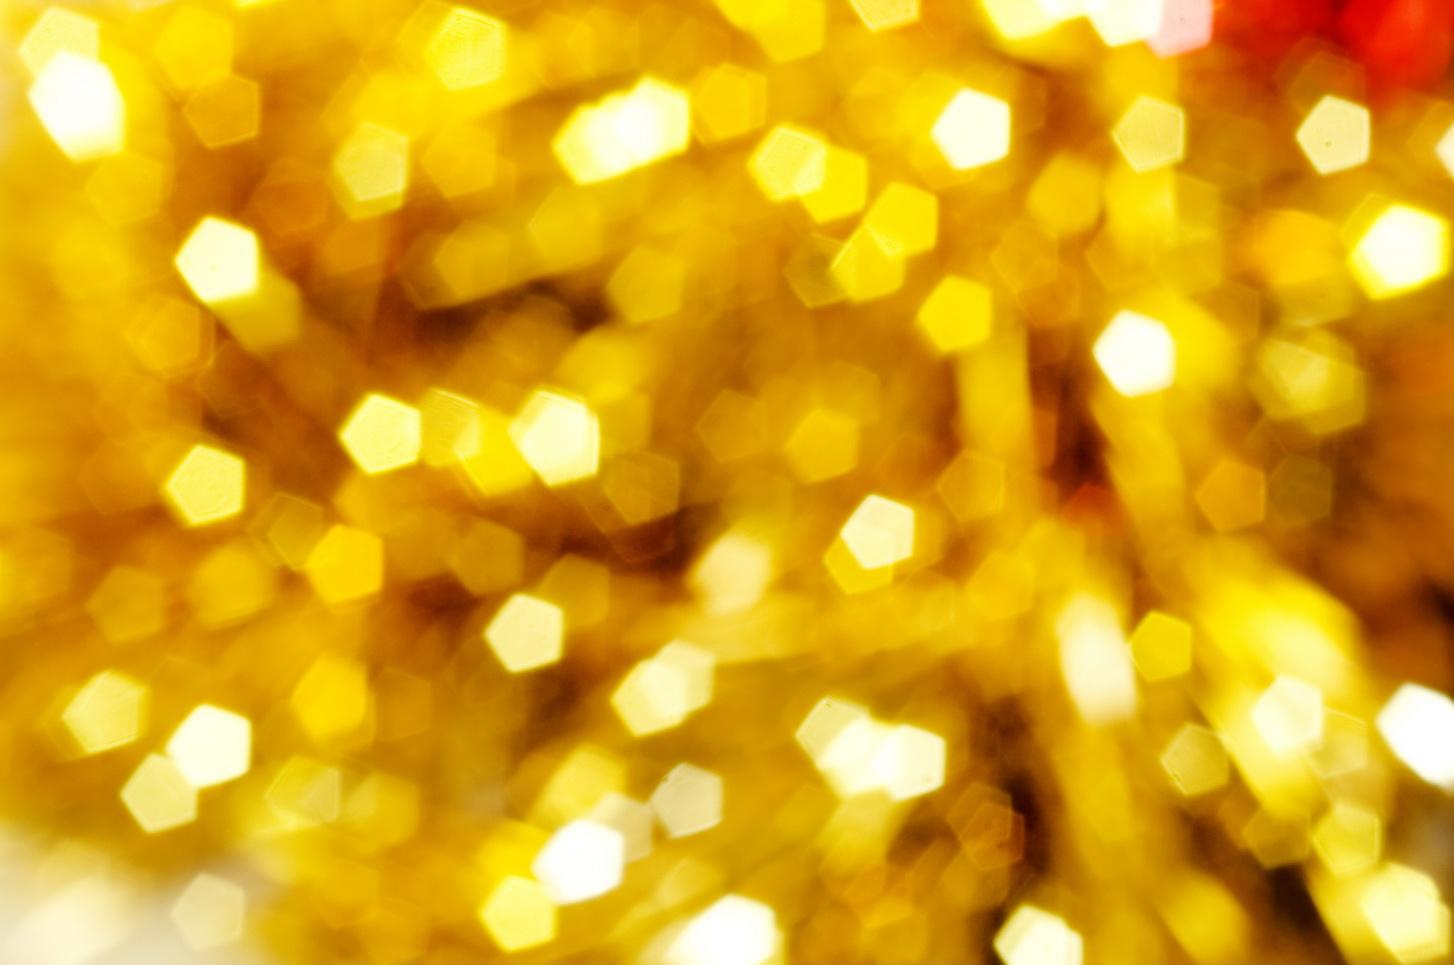 abstract background, Blur, Bright, Brilliant, Celebration, HQ Photo